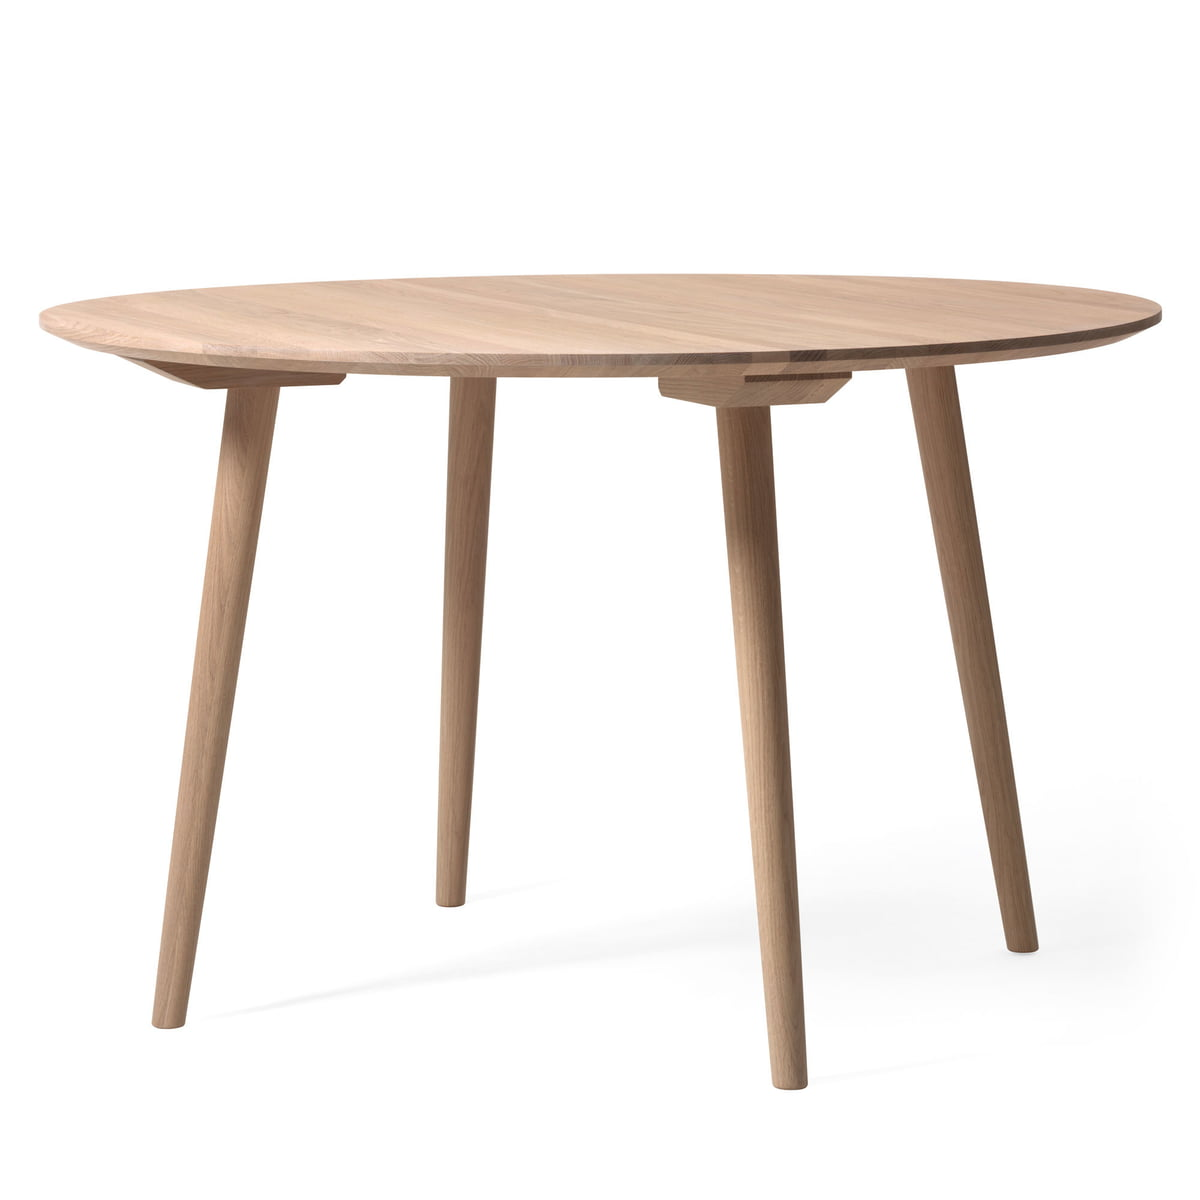 In Between SK4 bord fra &Tradition i interiørshoppen